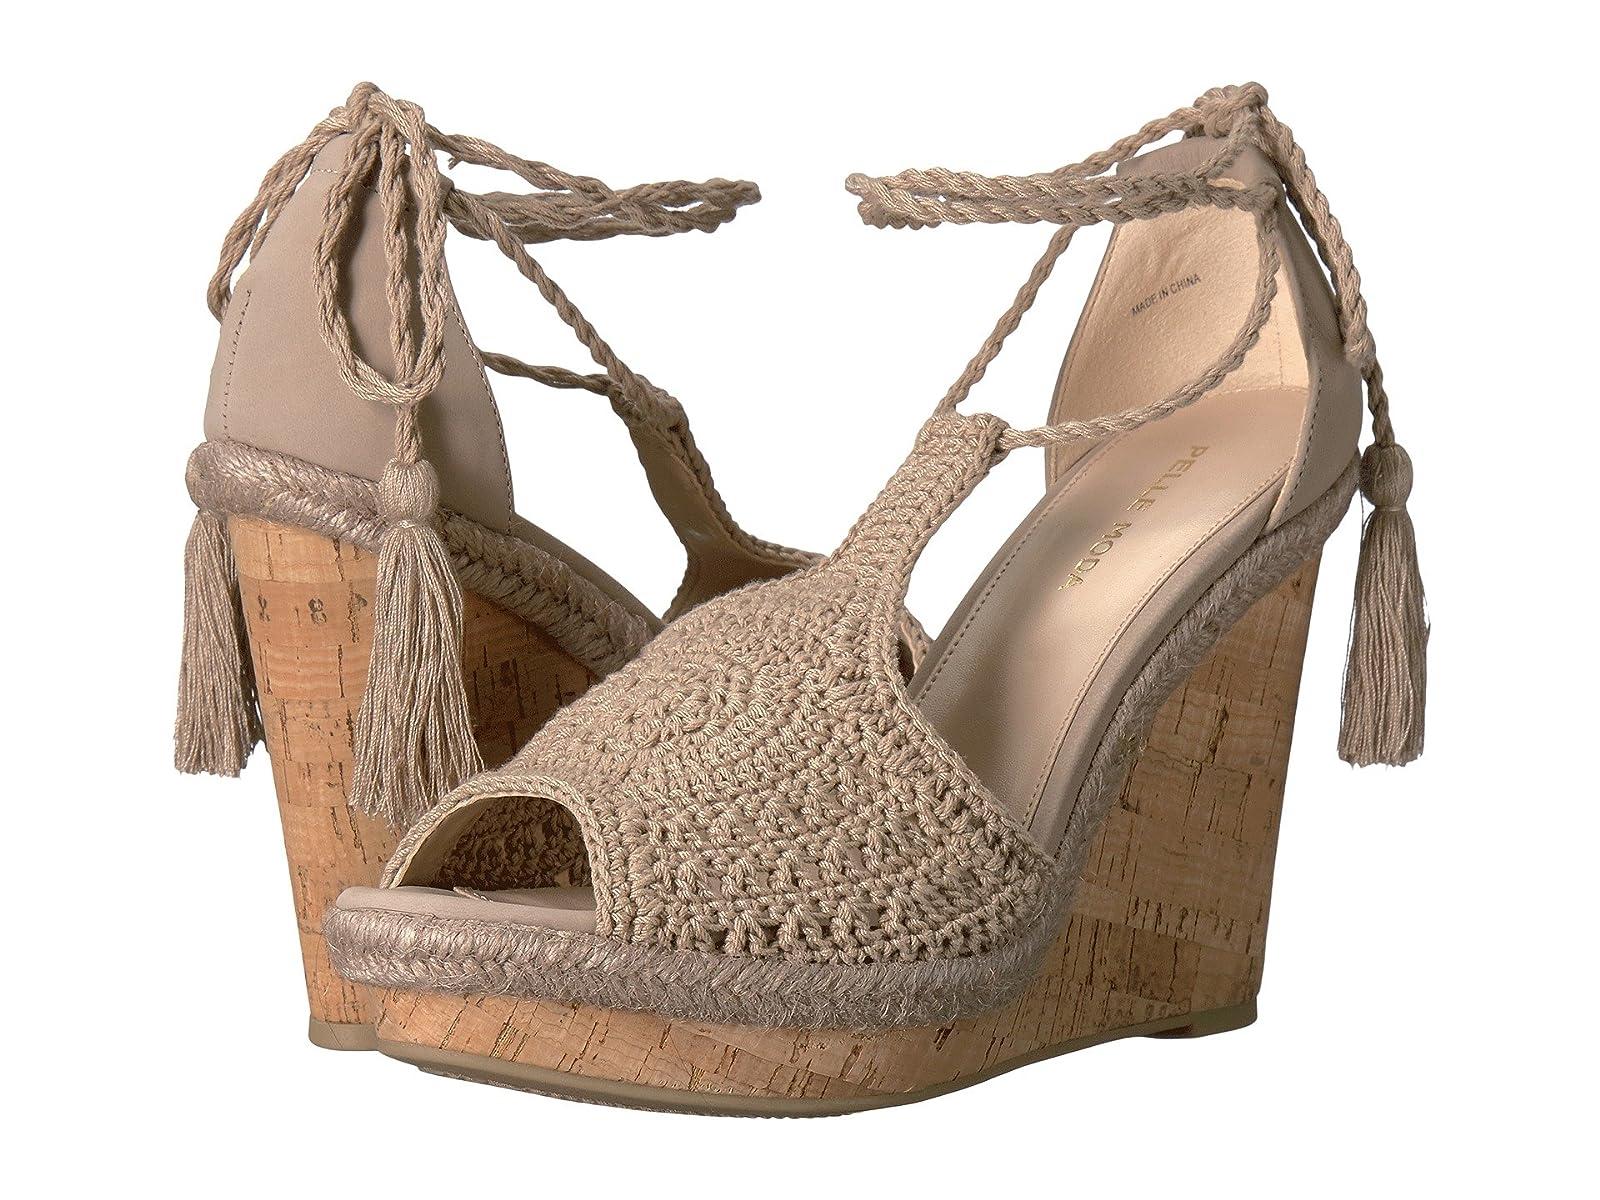 Pelle Moda WadeCheap and distinctive eye-catching shoes